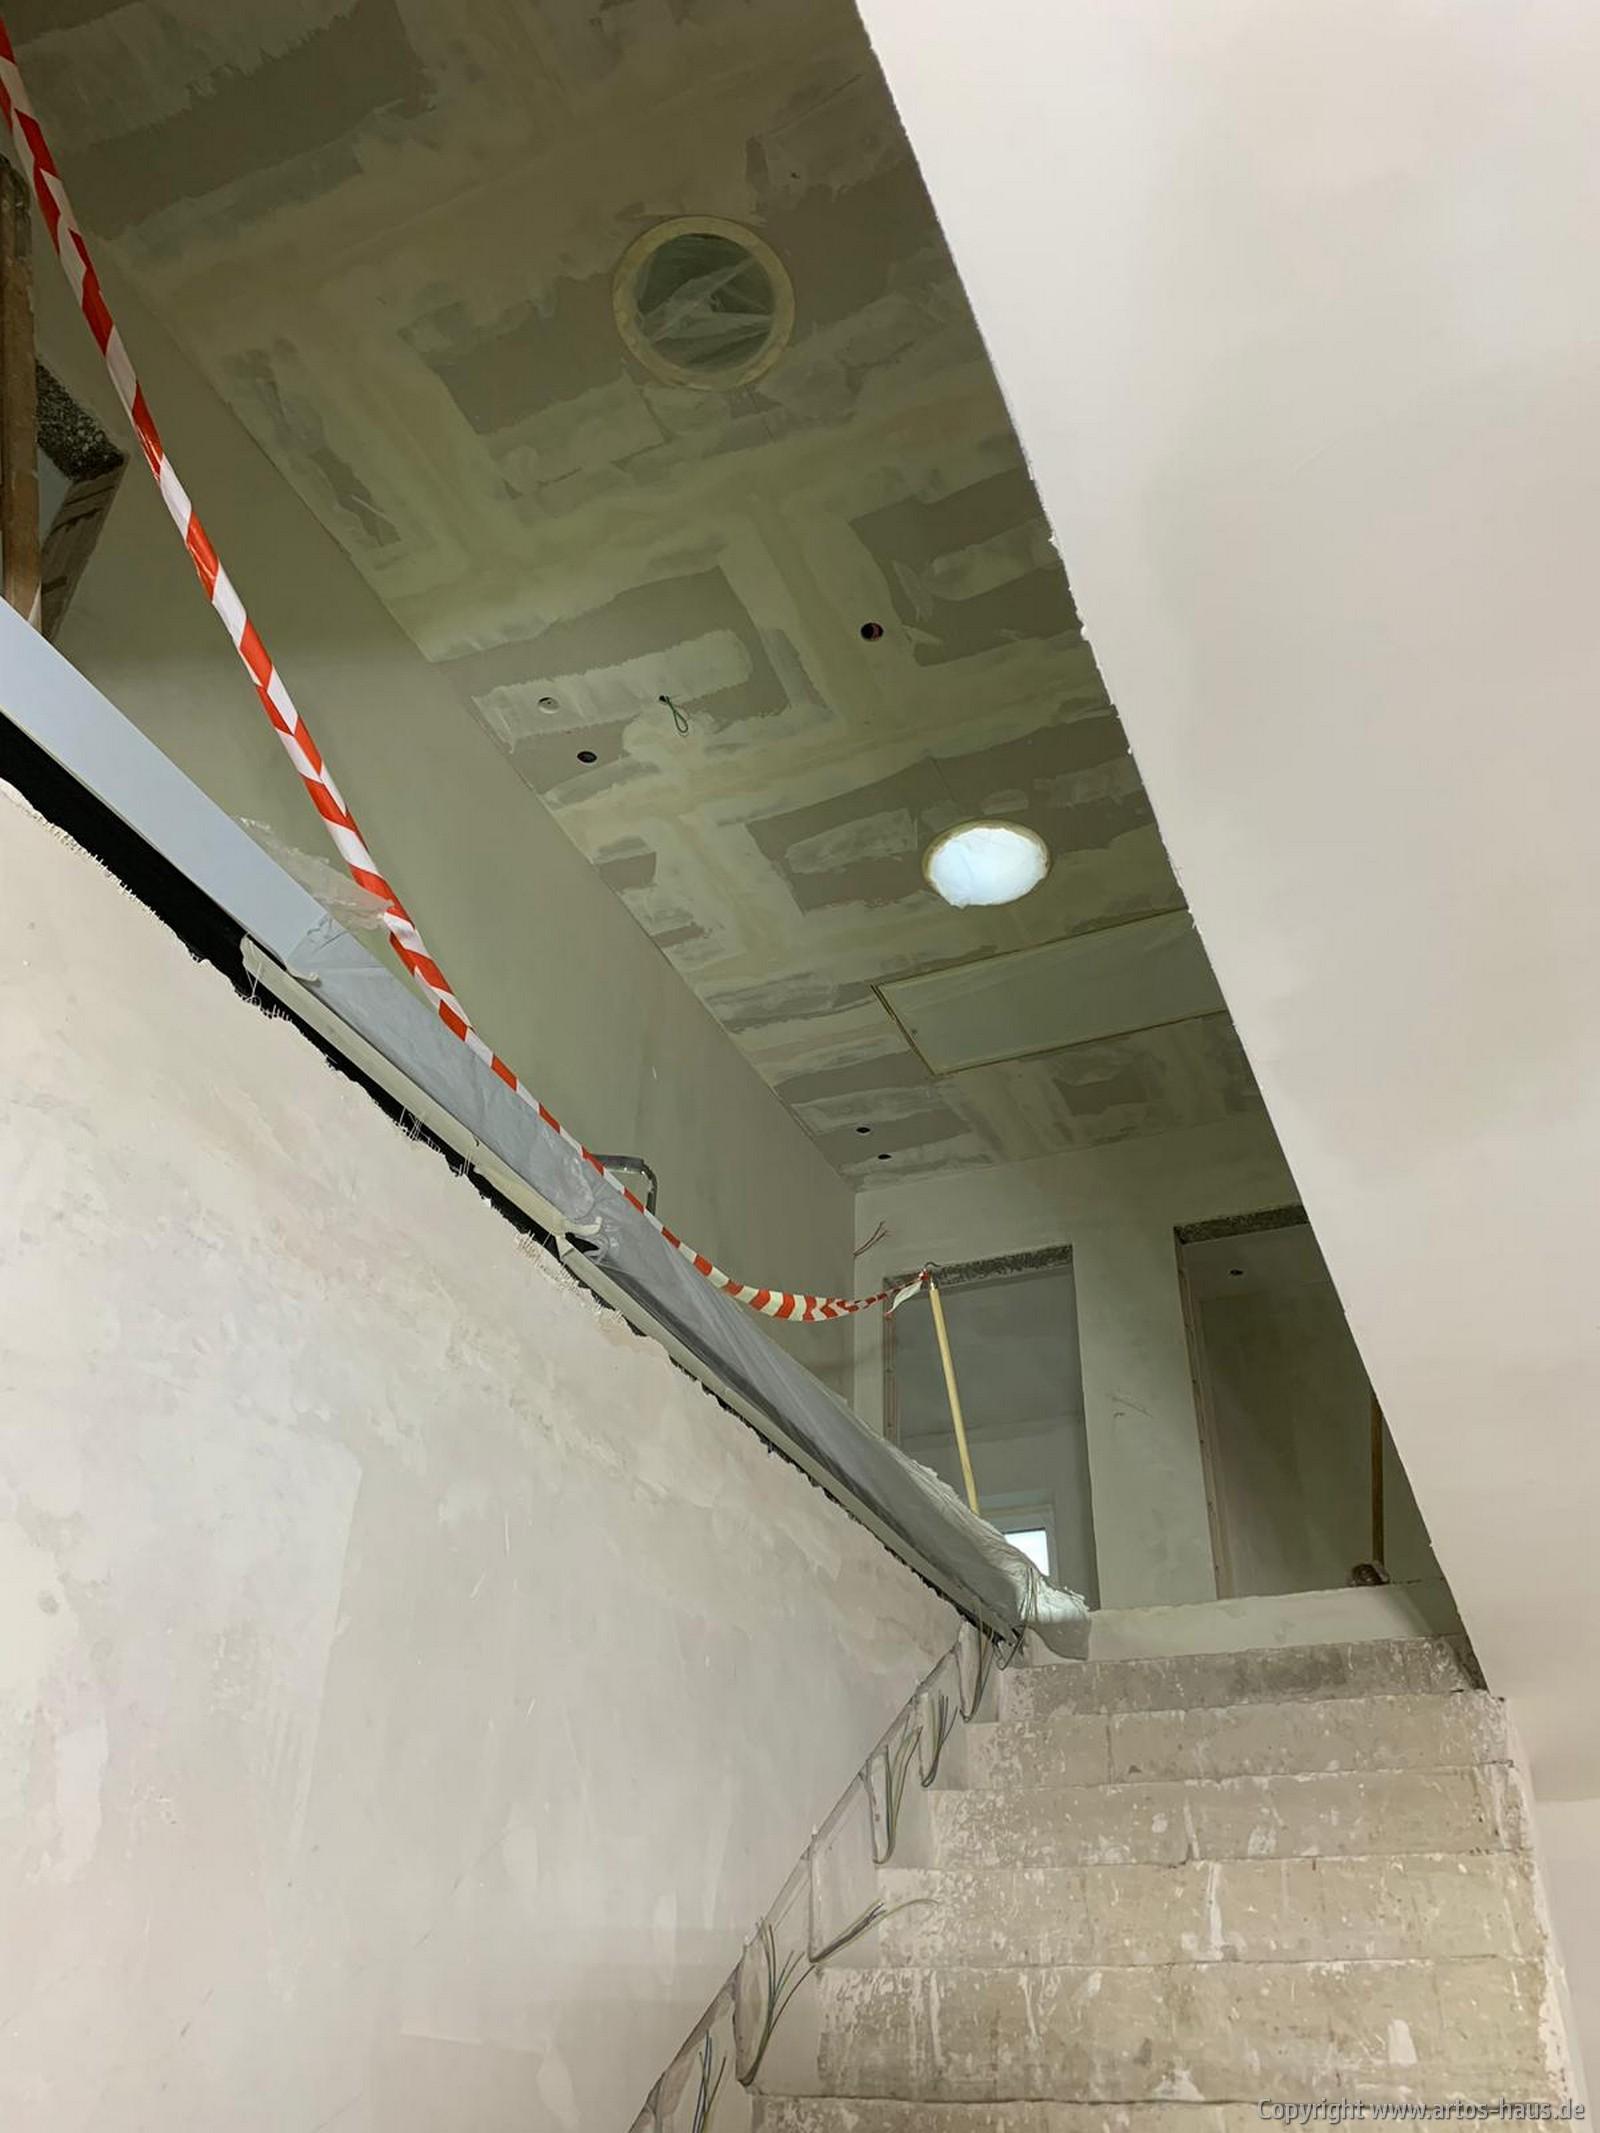 Innenputz ujnd Trockenbau fertiggestellt 8